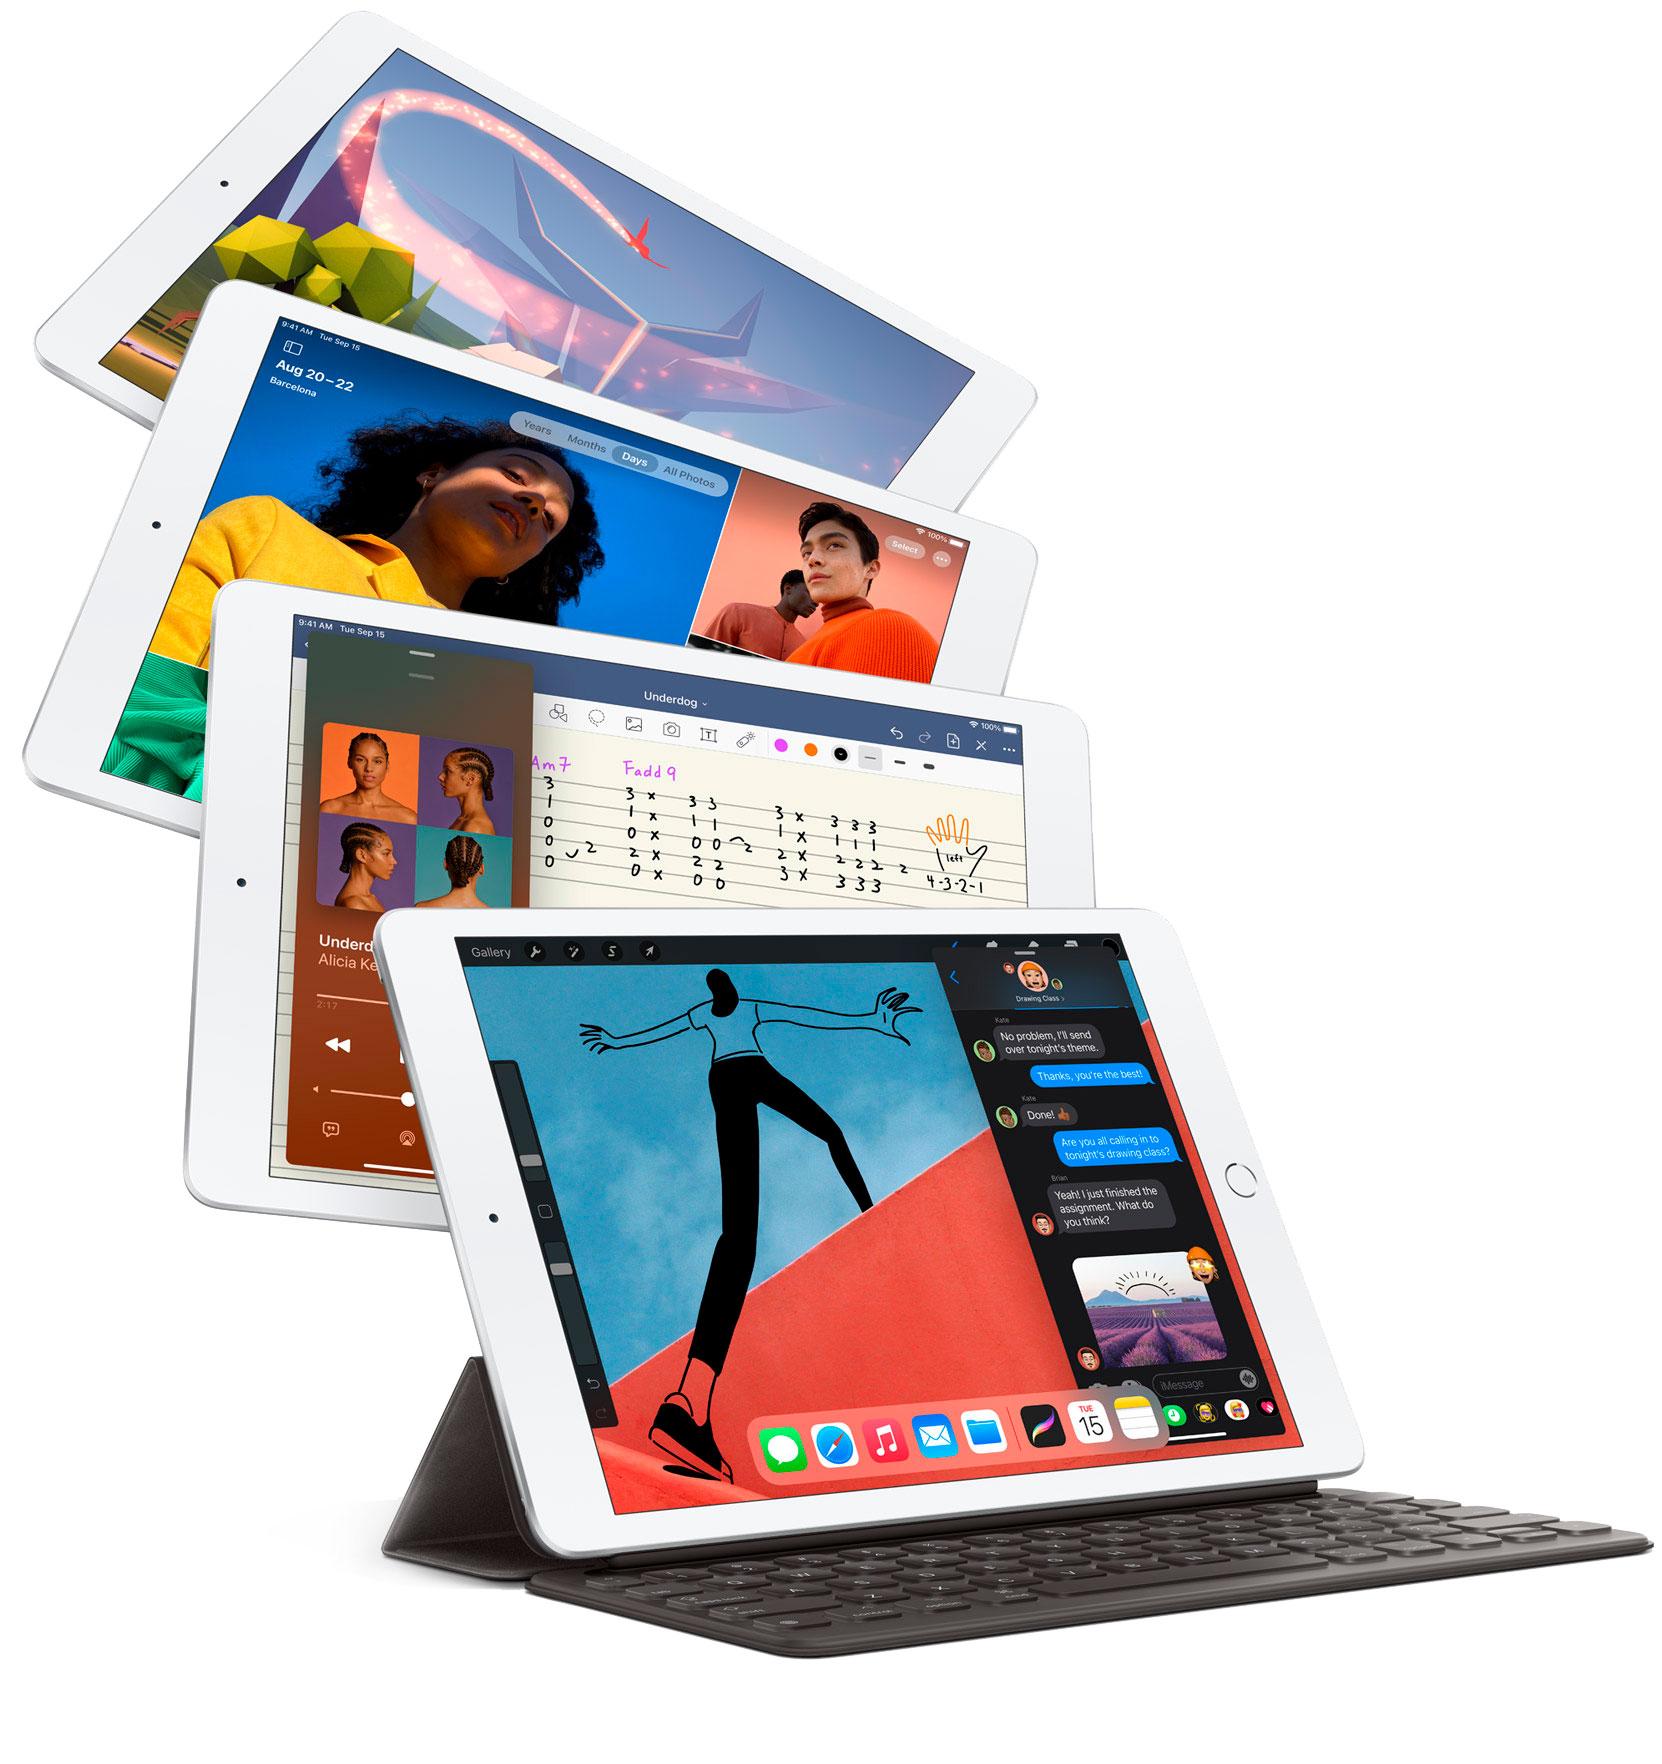 https://www.macfreak.nl/modules/news/images/zArt.iPad8eGeneratie2020Waaier.jpg